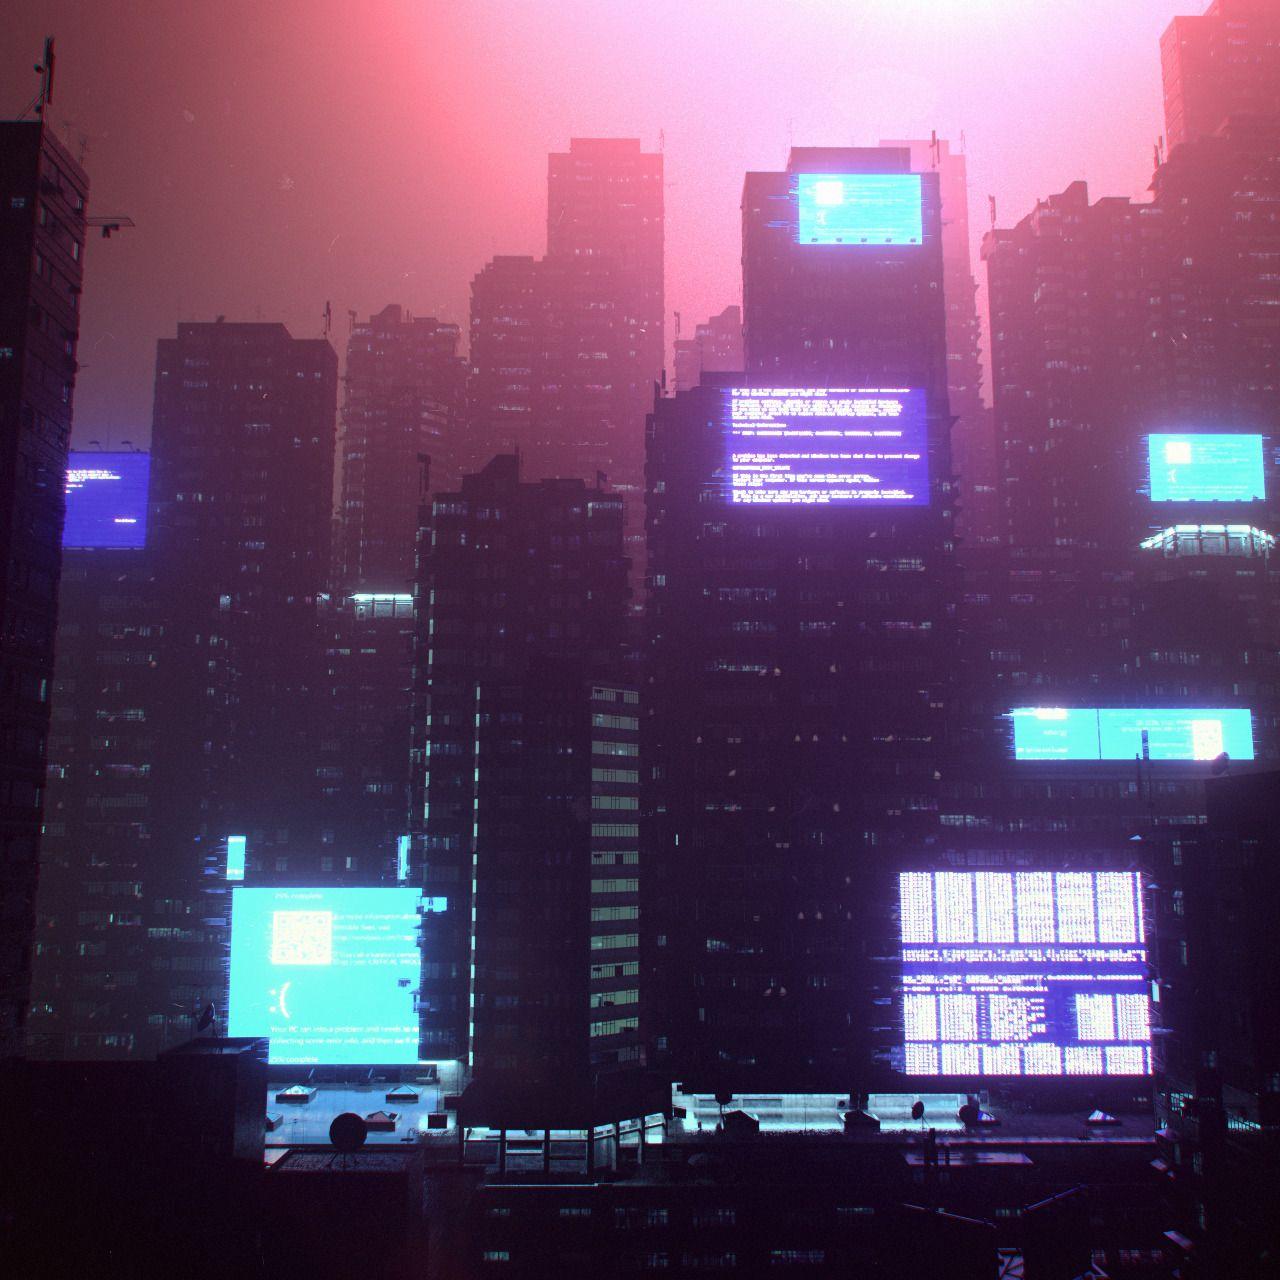 Unix Glitch 2038 - [DAY_933]Future Slums kit by: KitBash3d